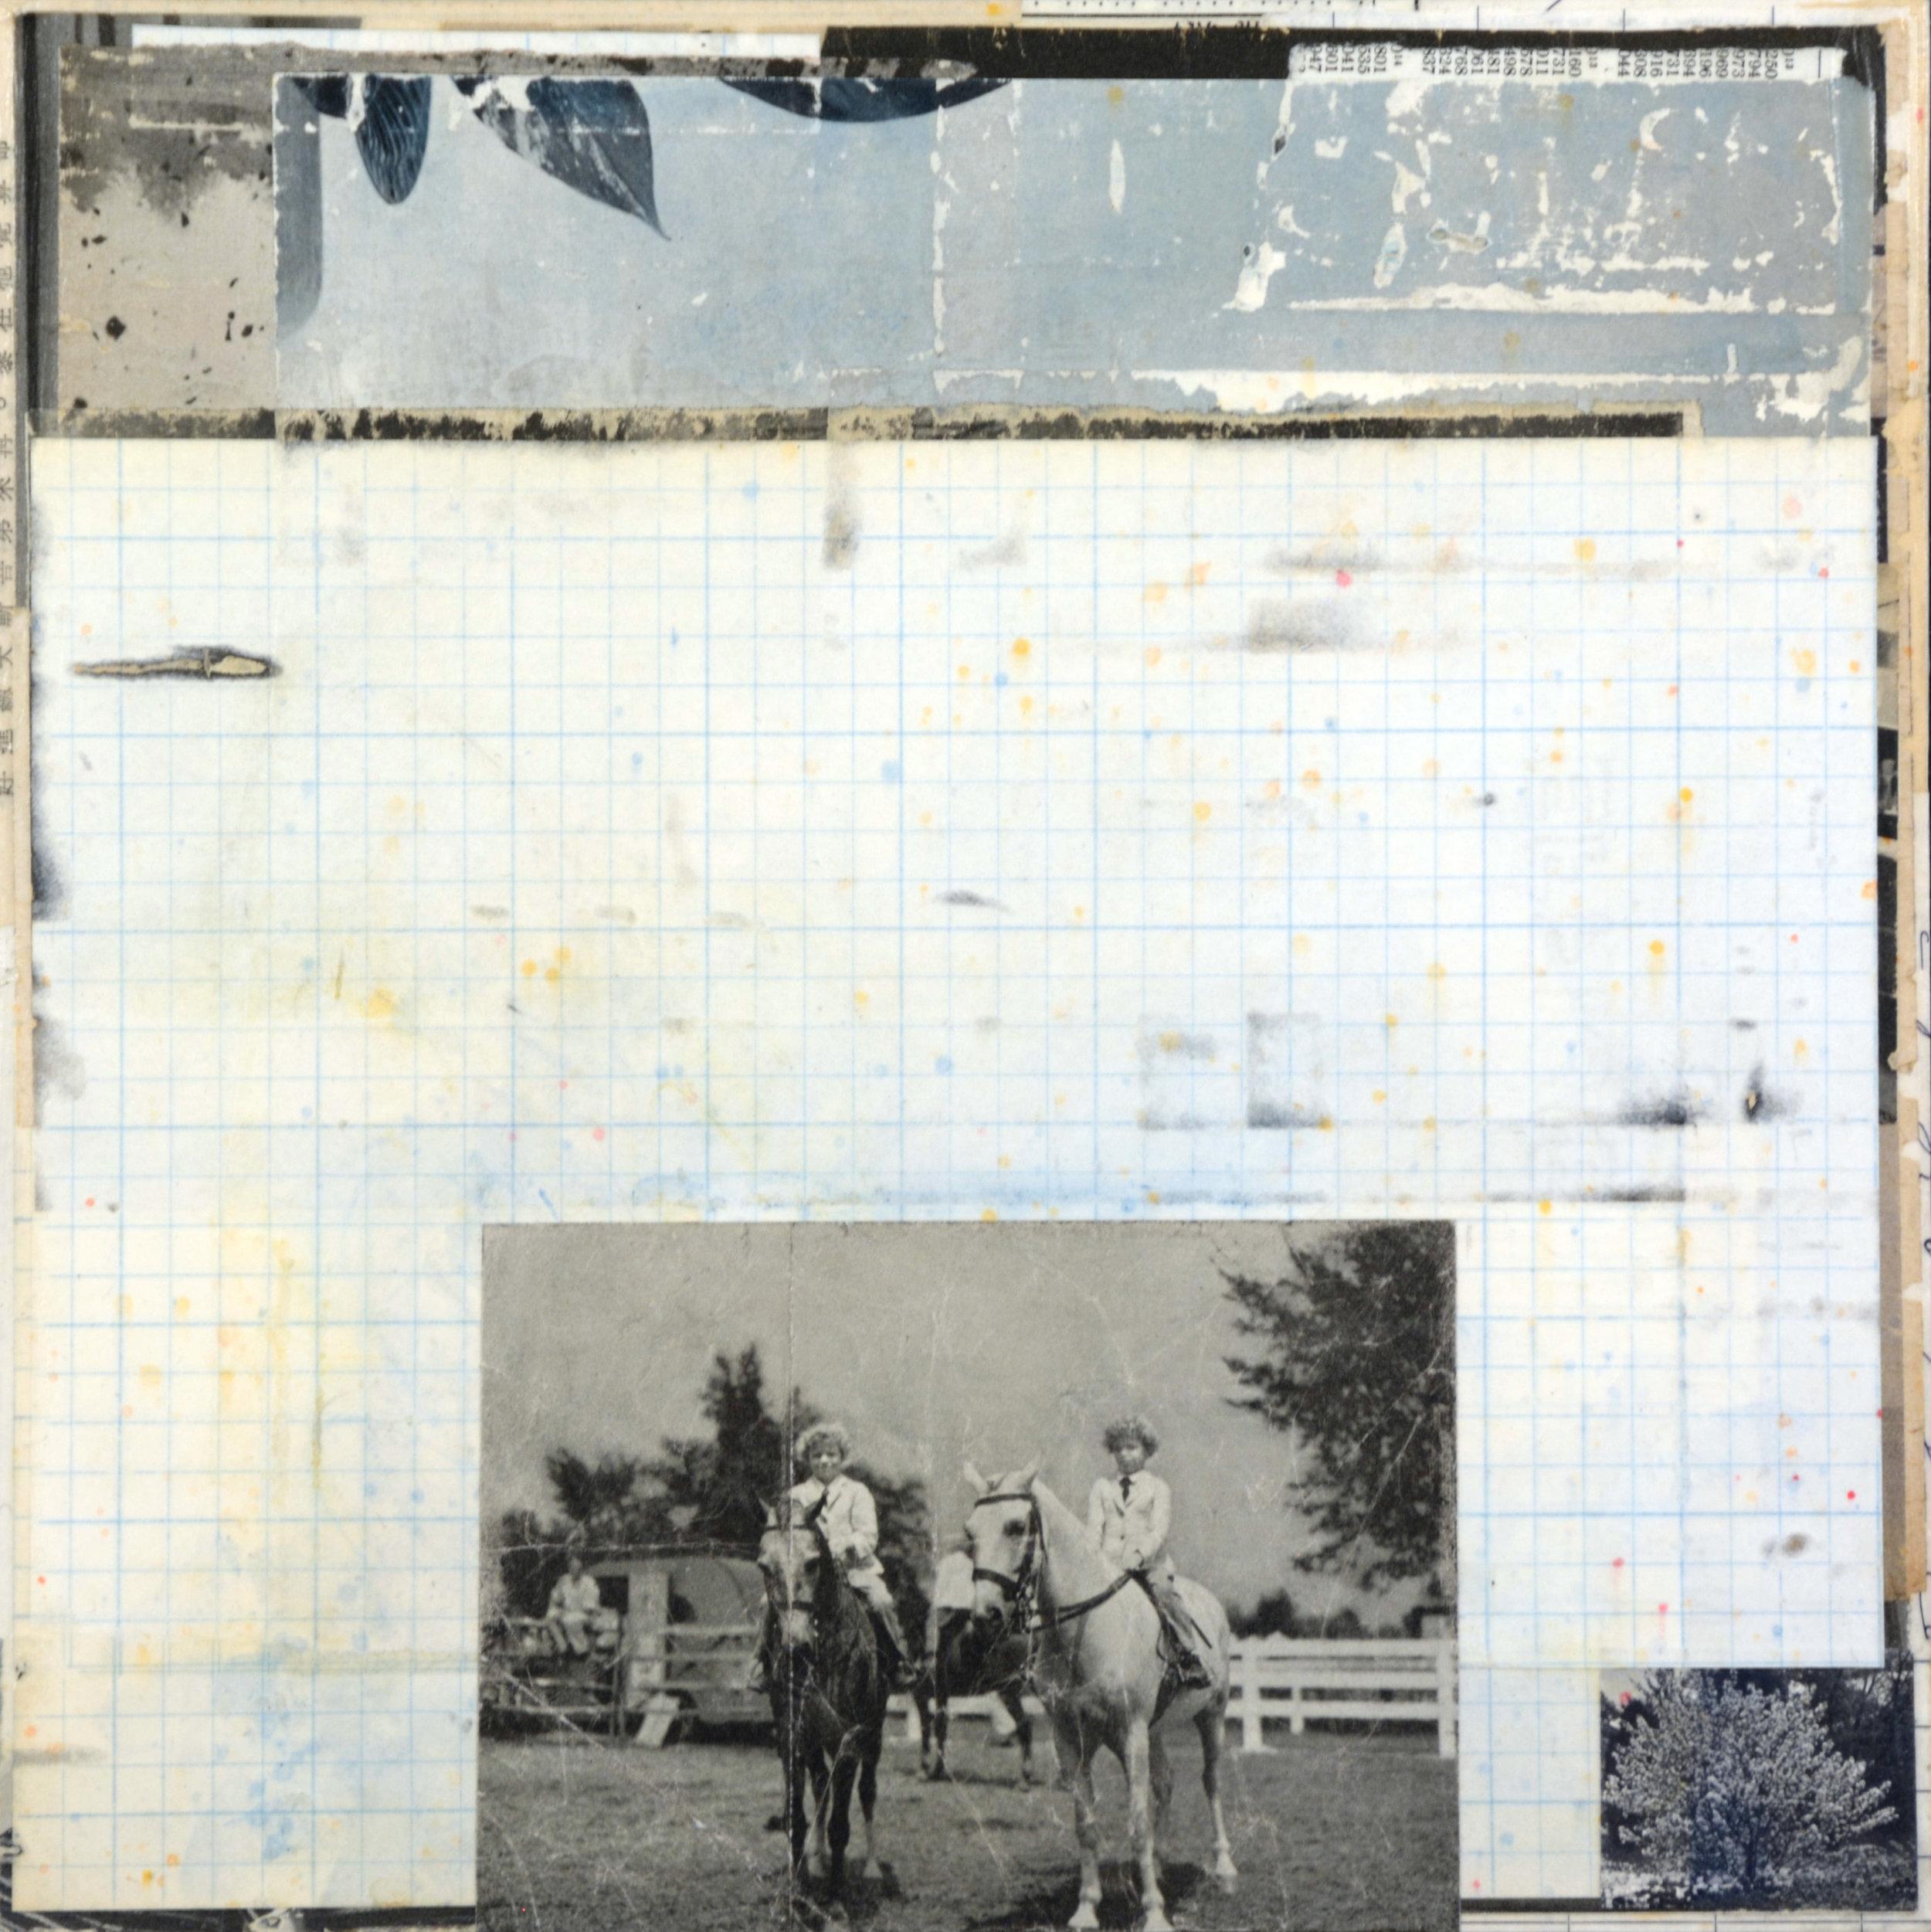 Pony Club Picnic, 1936